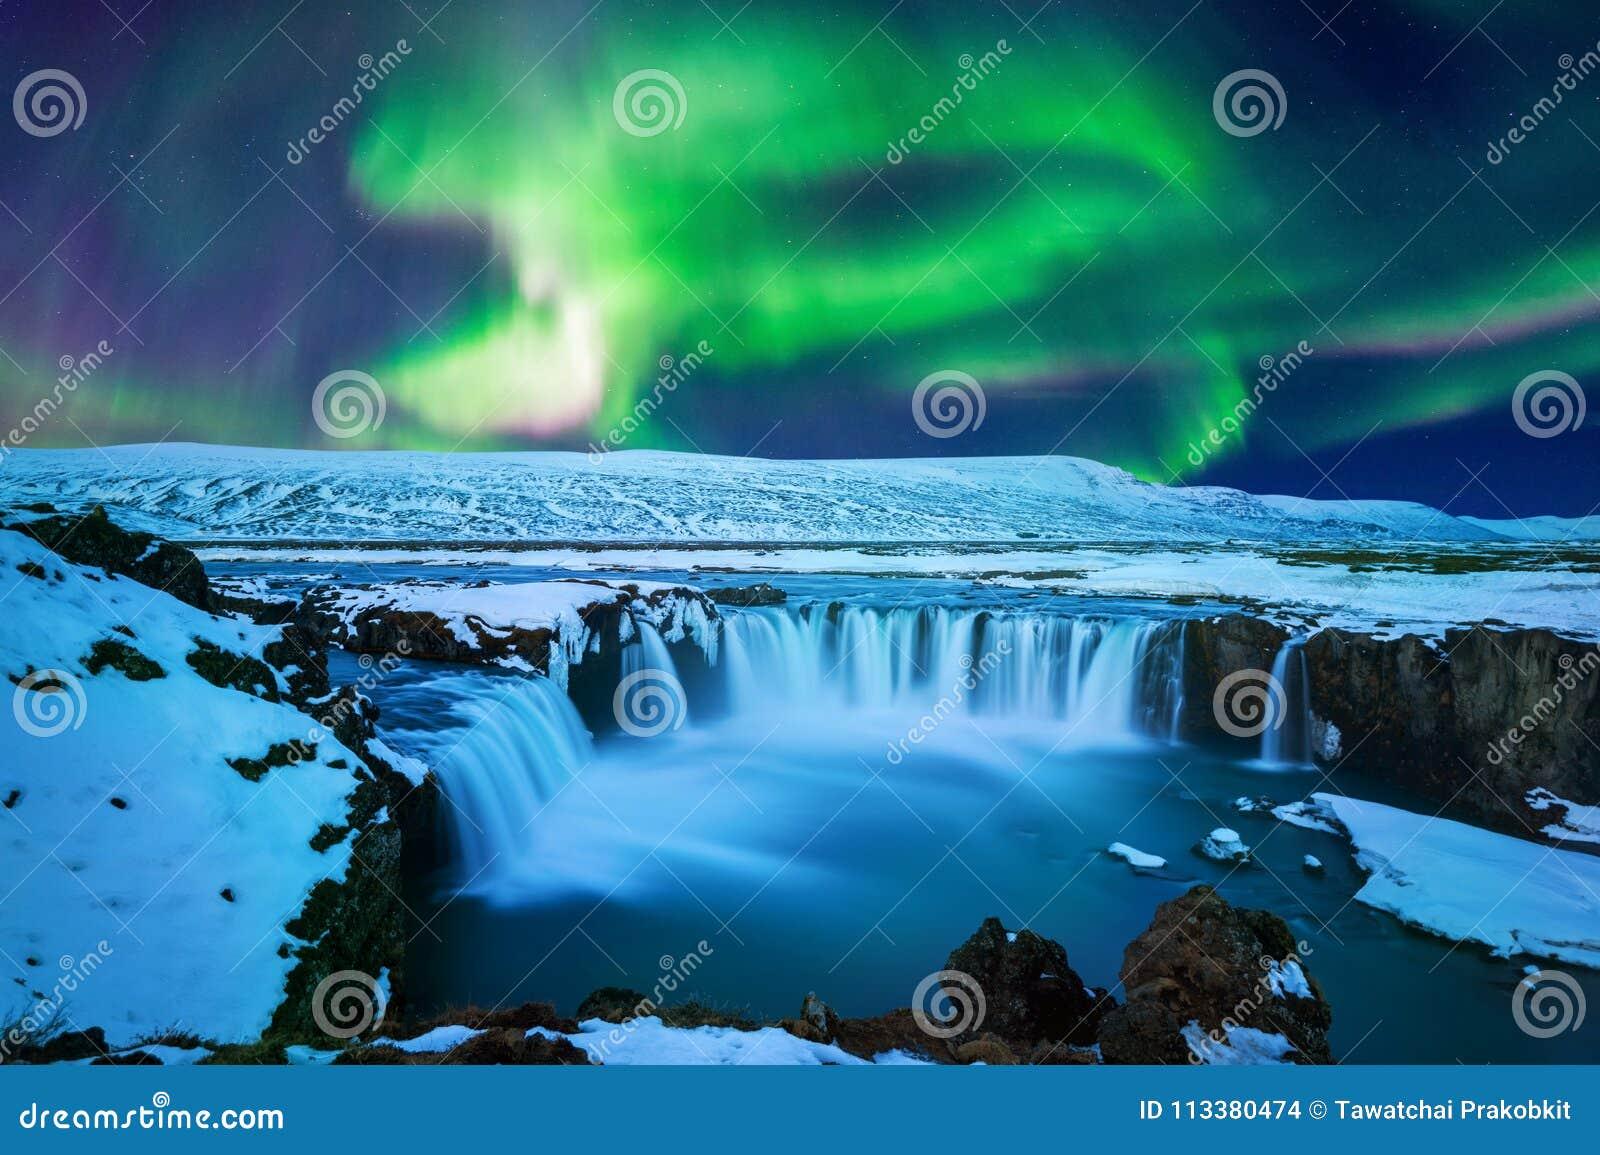 Lumière du nord, aurora borealis à la cascade de Godafoss en hiver, Islande